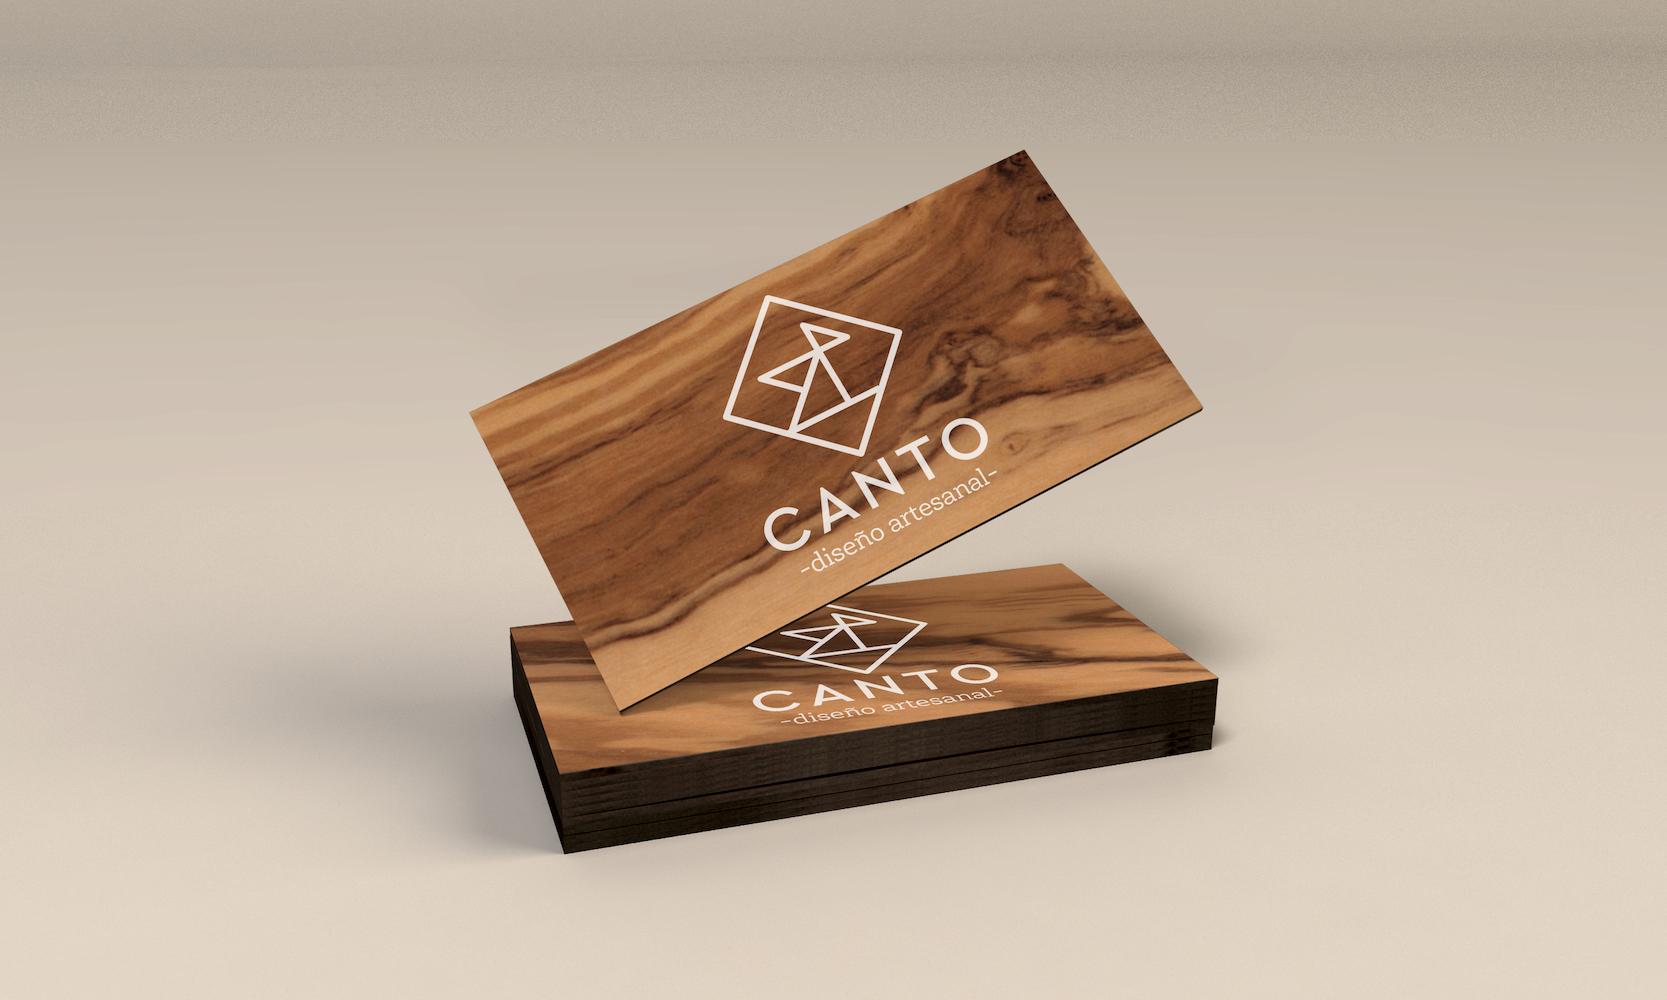 Canto.mx